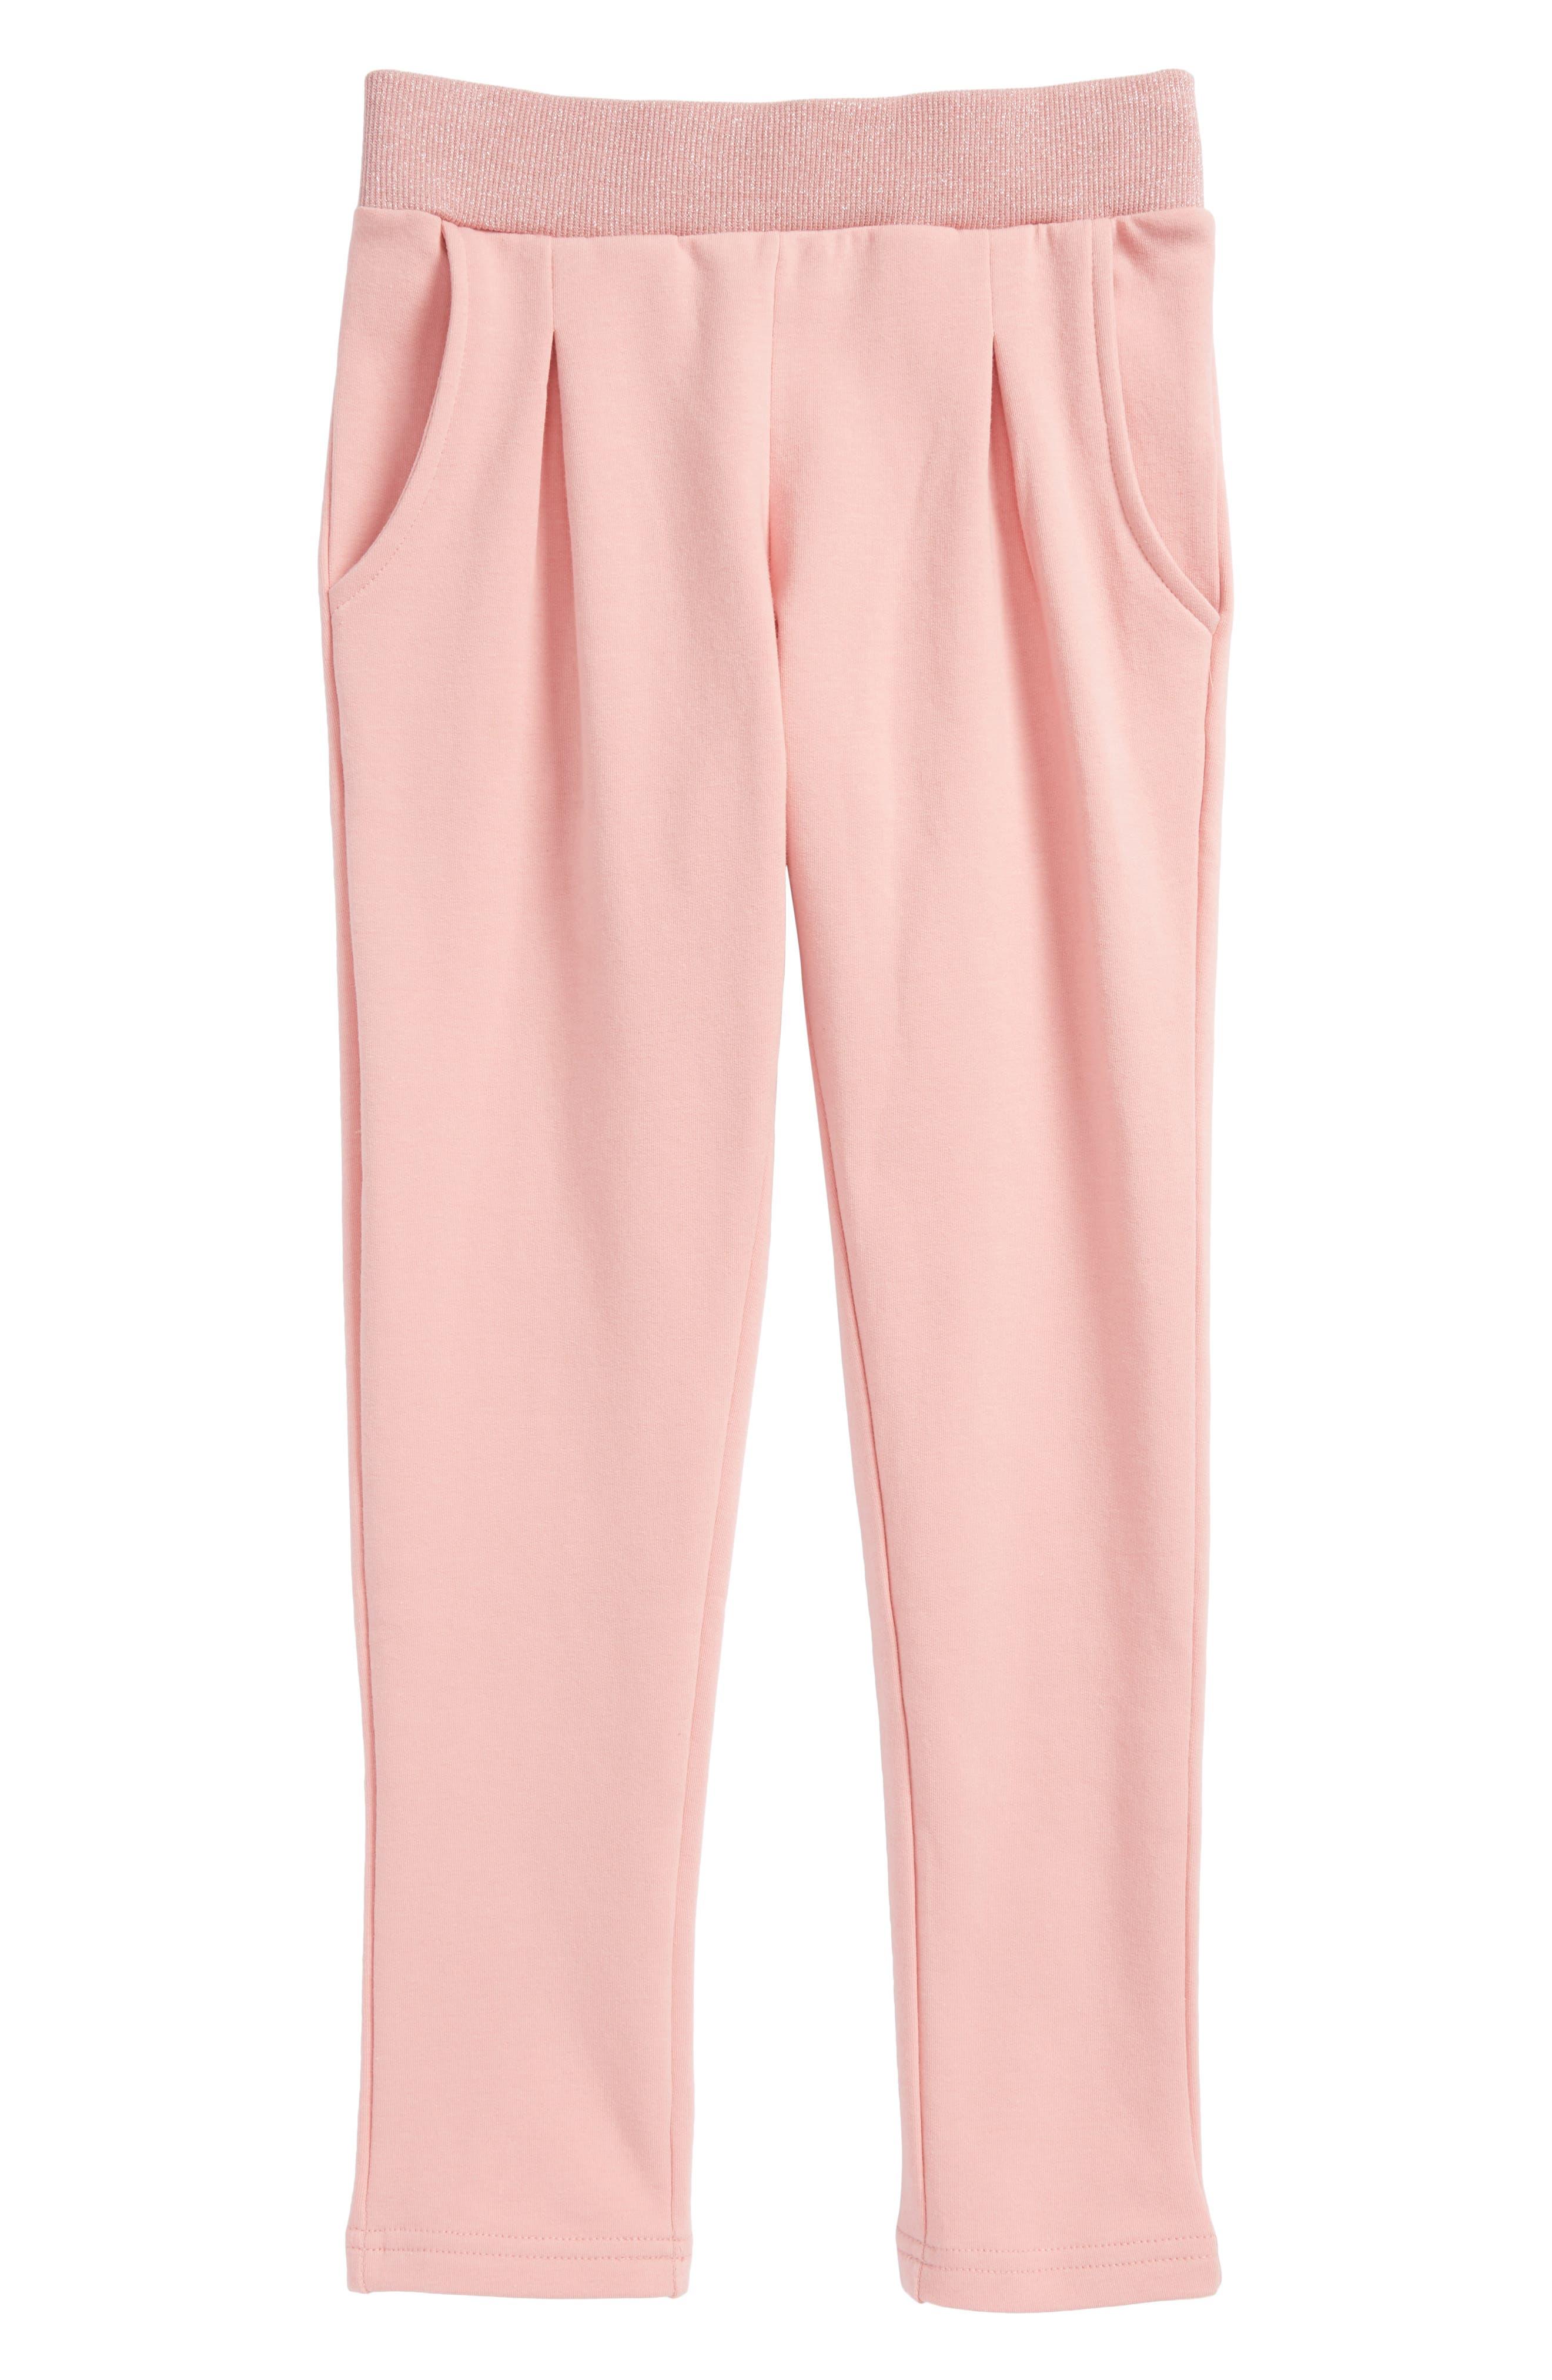 Nille Sweatpants,                         Main,                         color, 2034 Blush